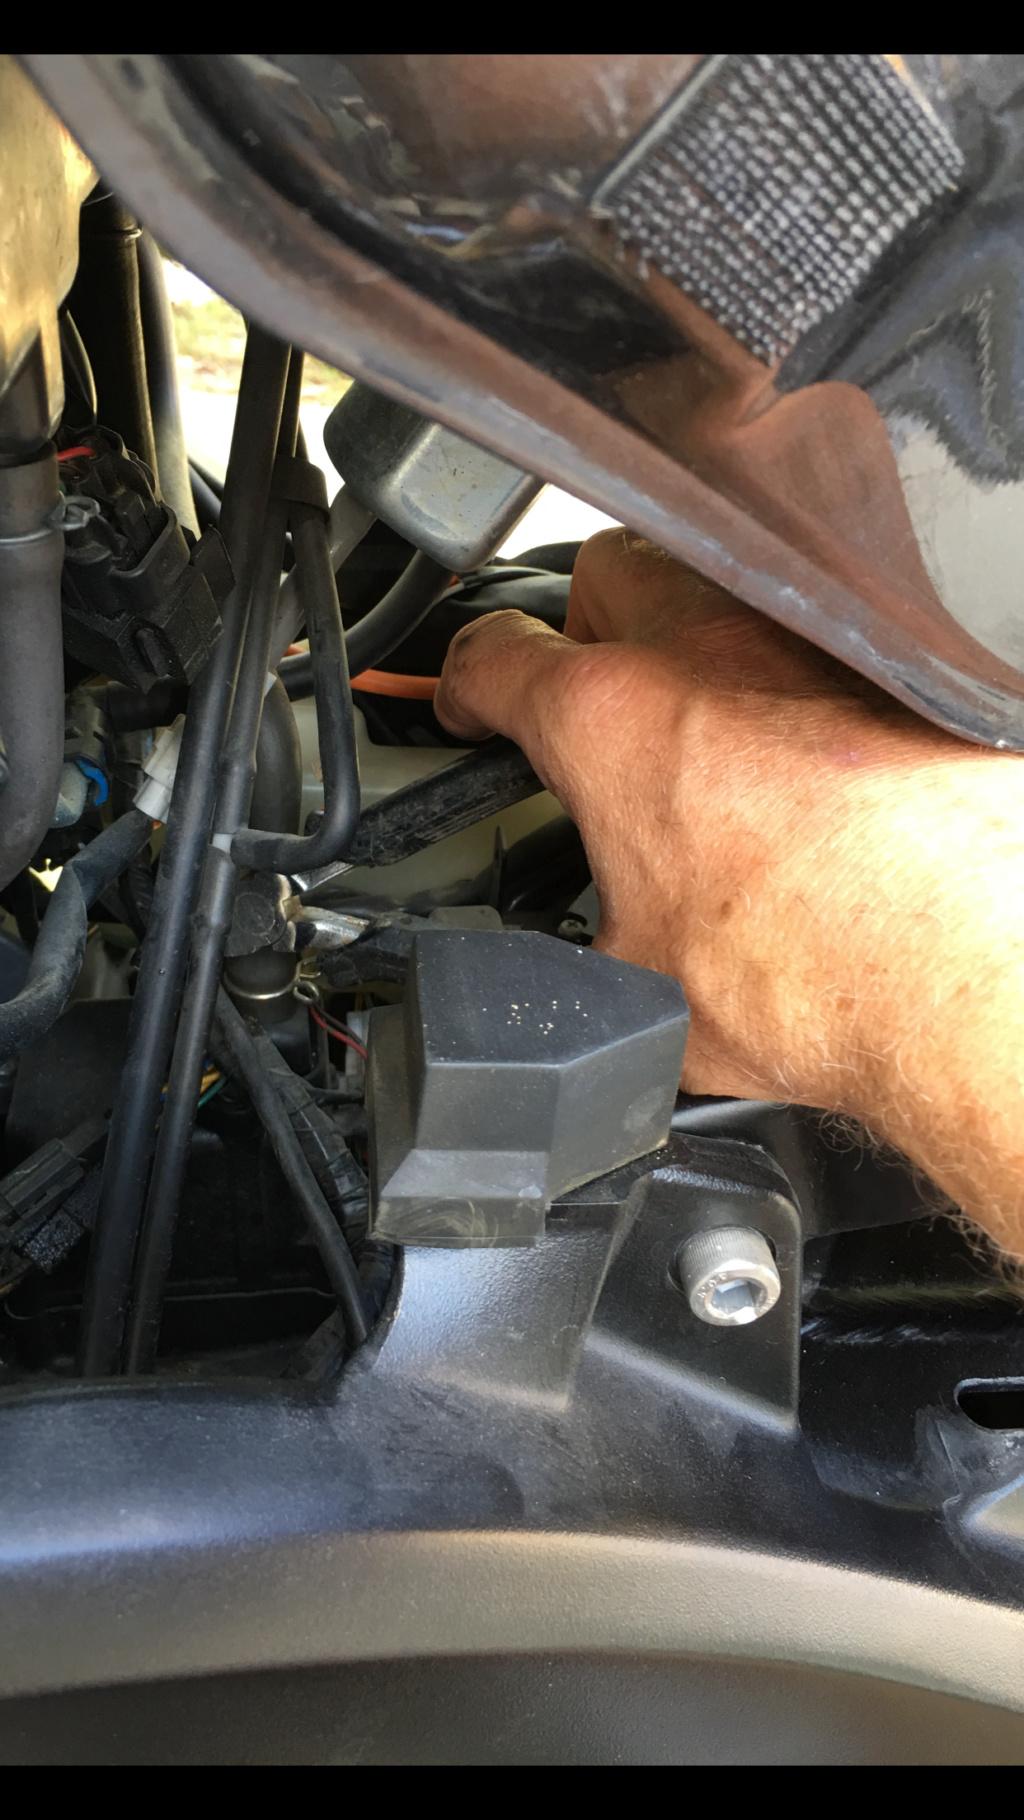 [TUTO] Installation du speedohealer V4 - Page 5 Df440e10